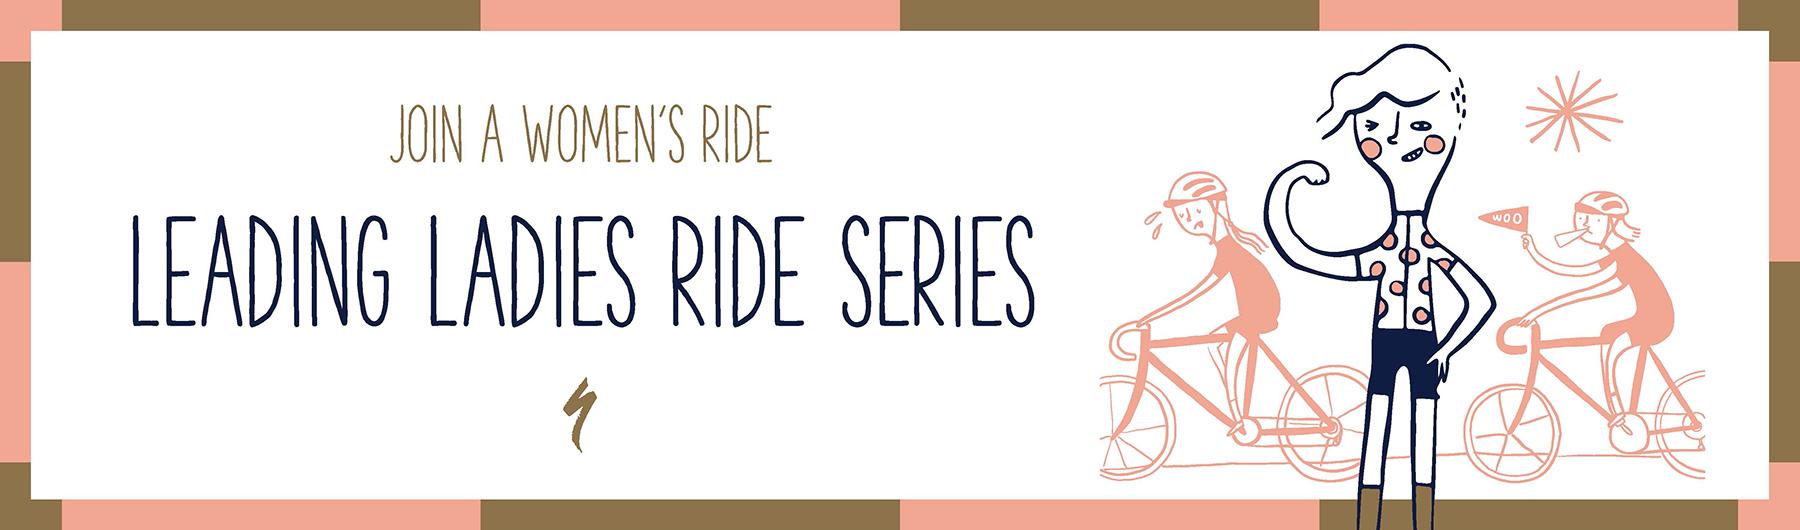 Worth It: Leading Ladies Ride Series USA